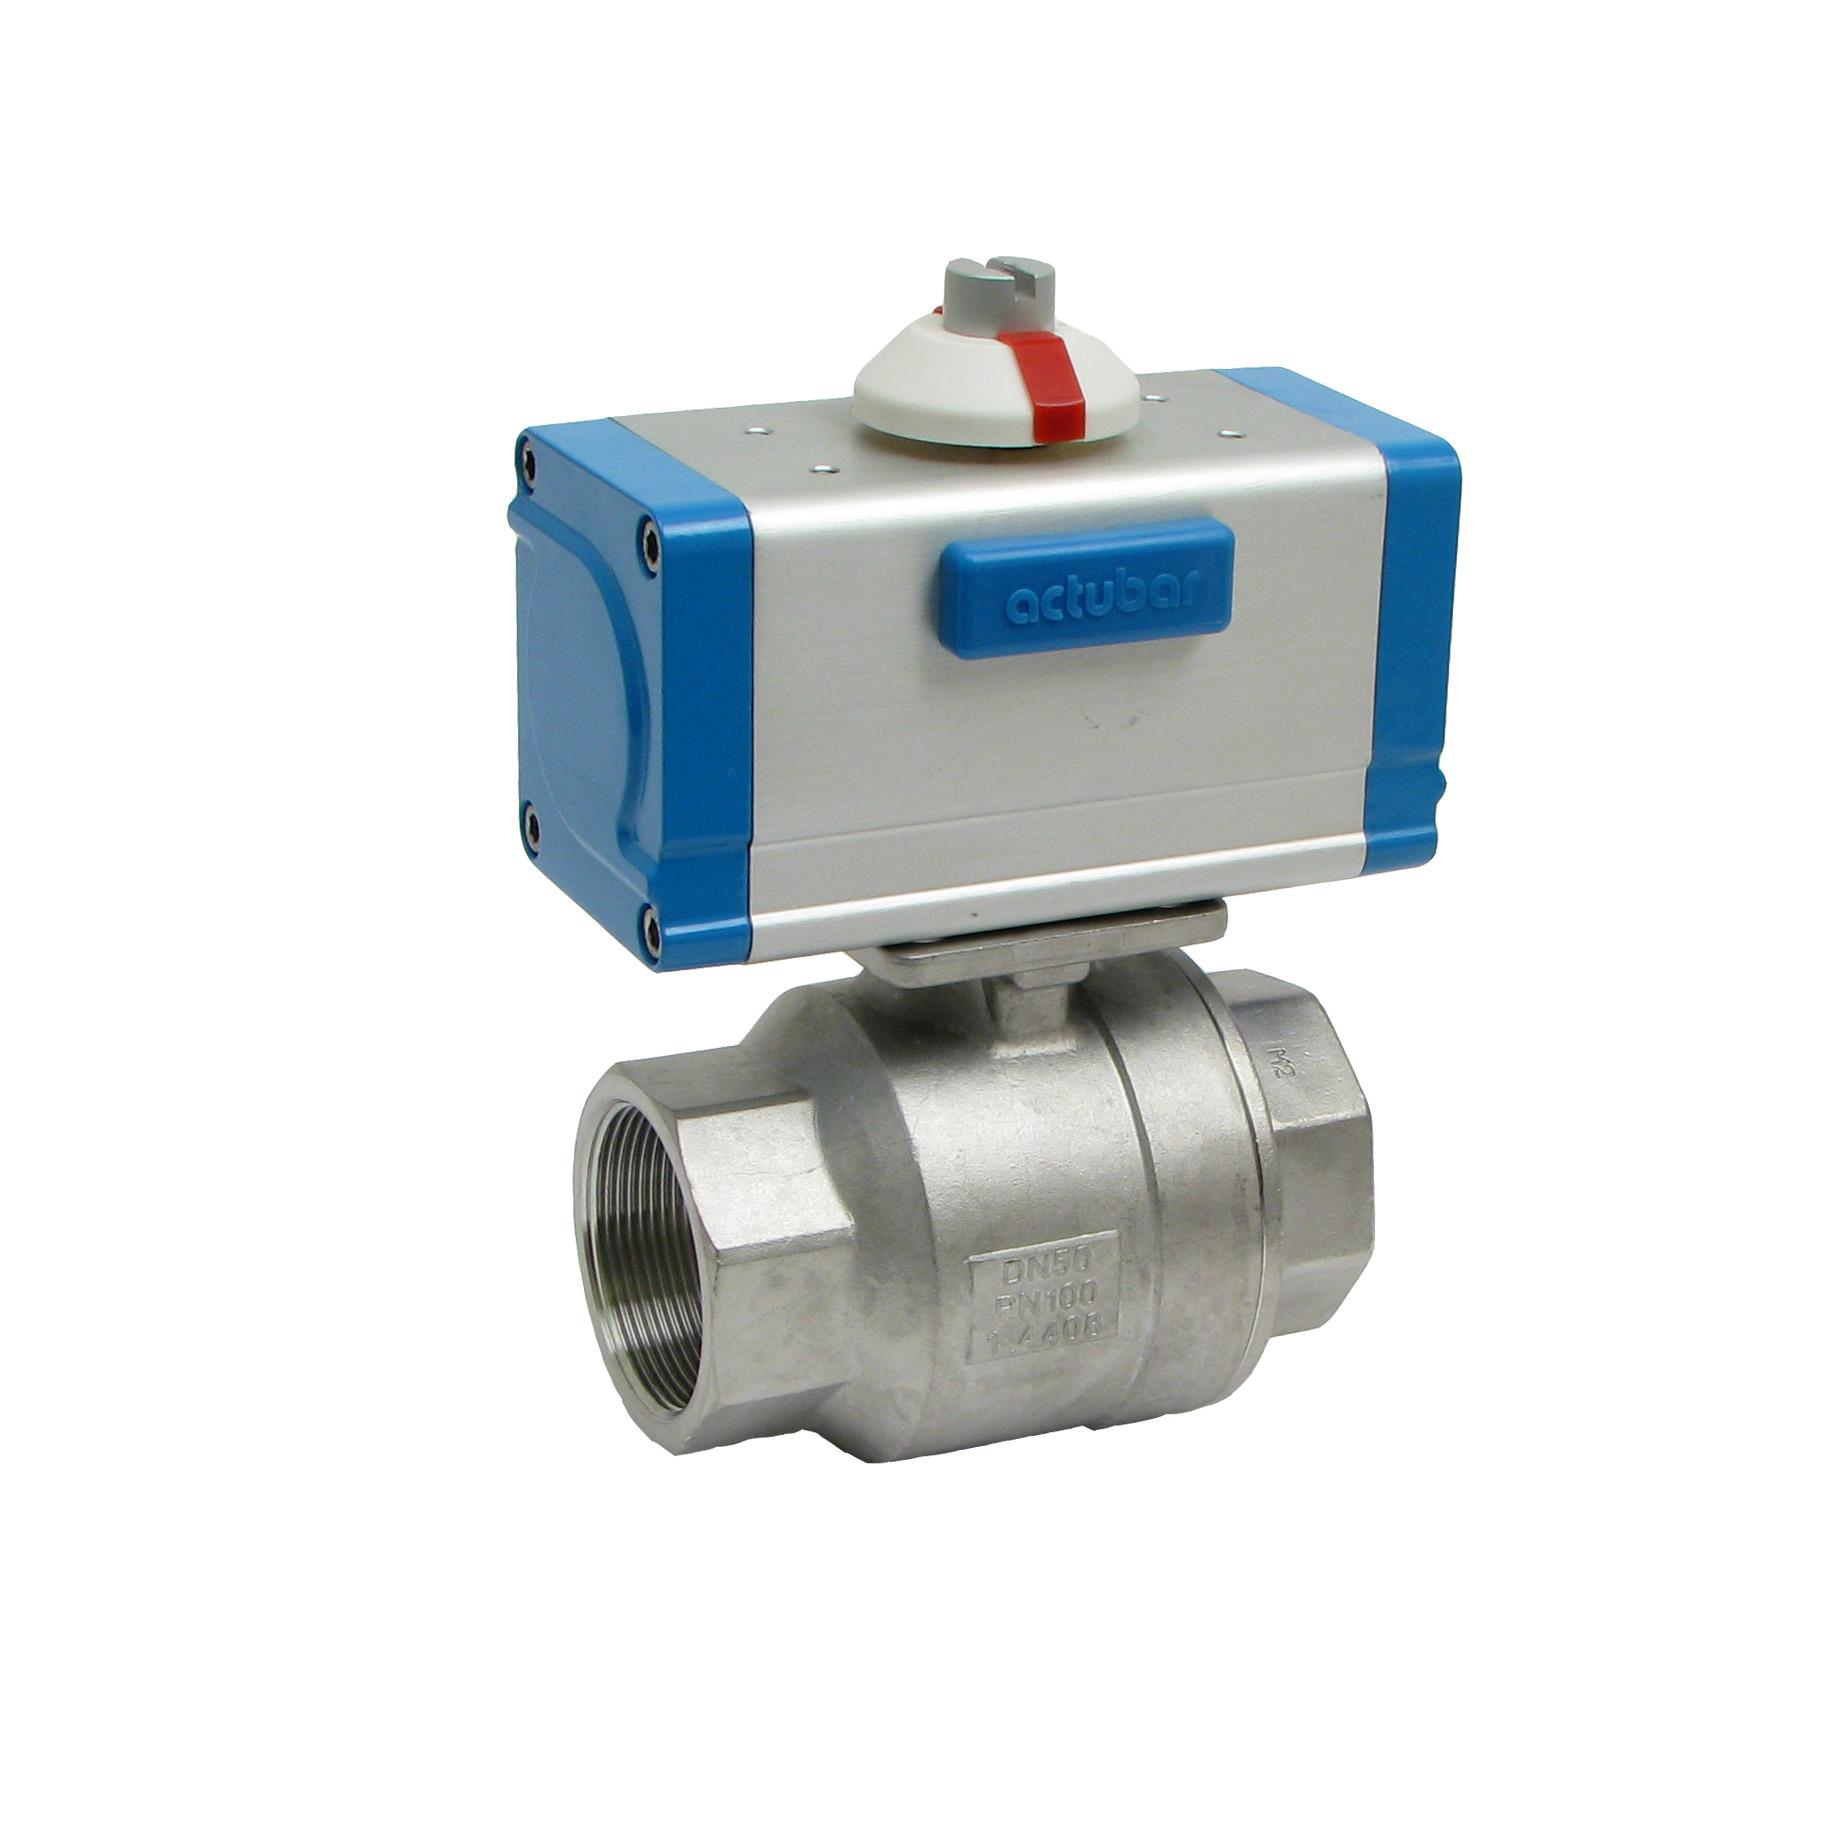 Ball valve Actuator | AL MAHIR FACTORIES MACHINERY SPARE PARTS TR. LLC